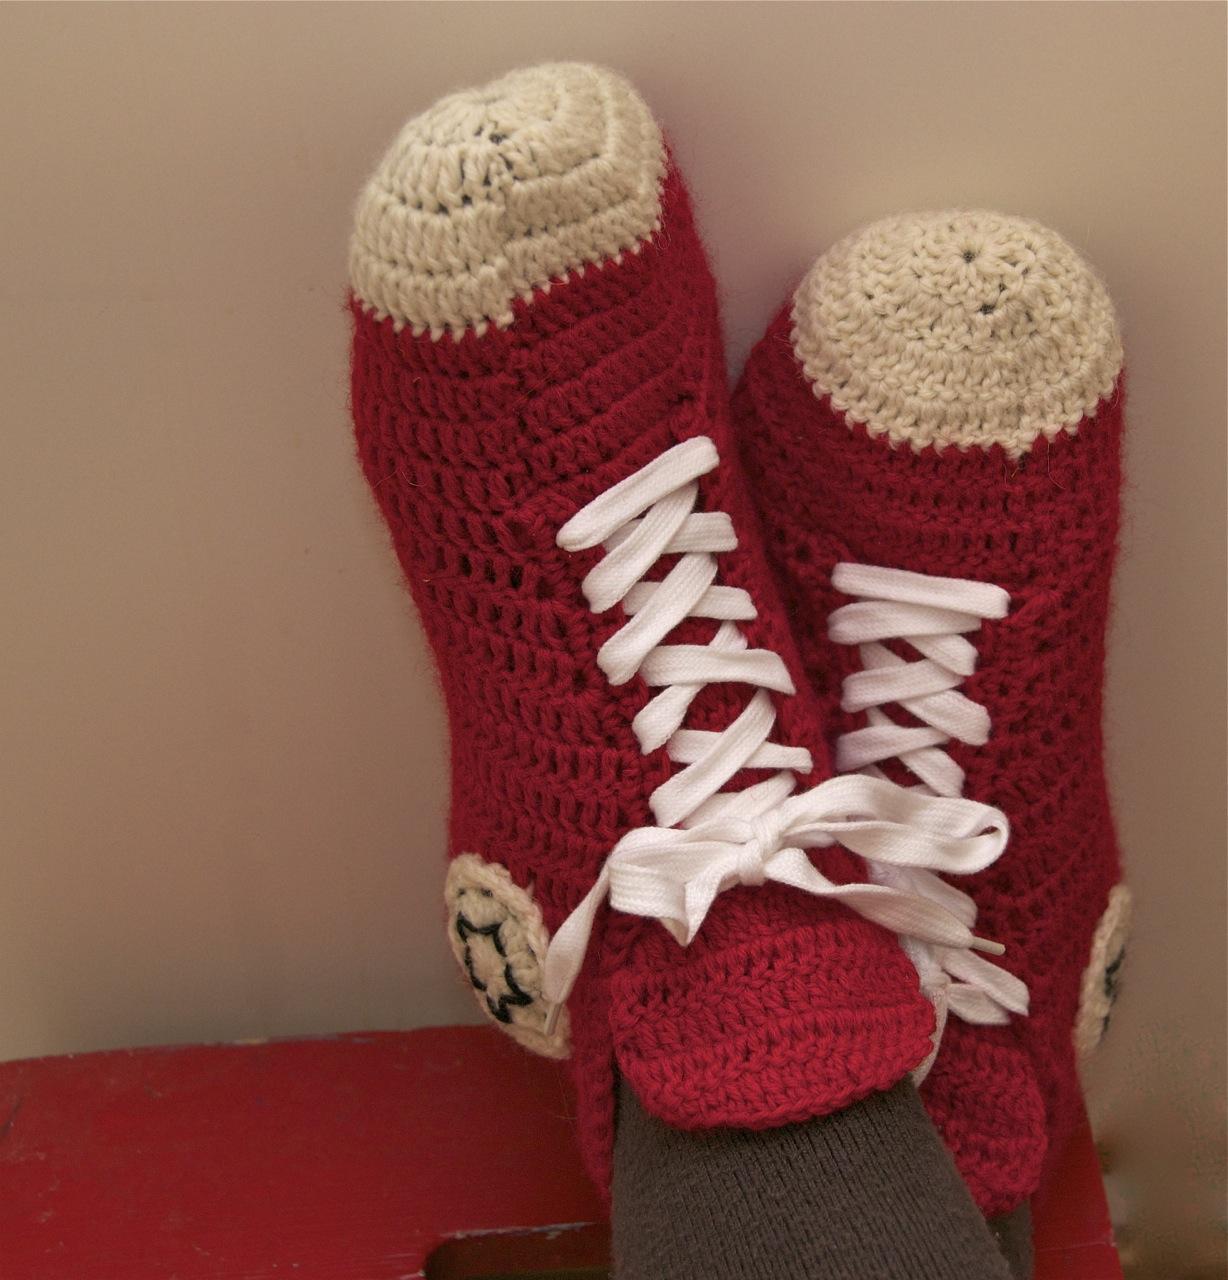 cool crochet patterns coolest crochet slippers patterns for boys ..sneakers! DWKNLDZ